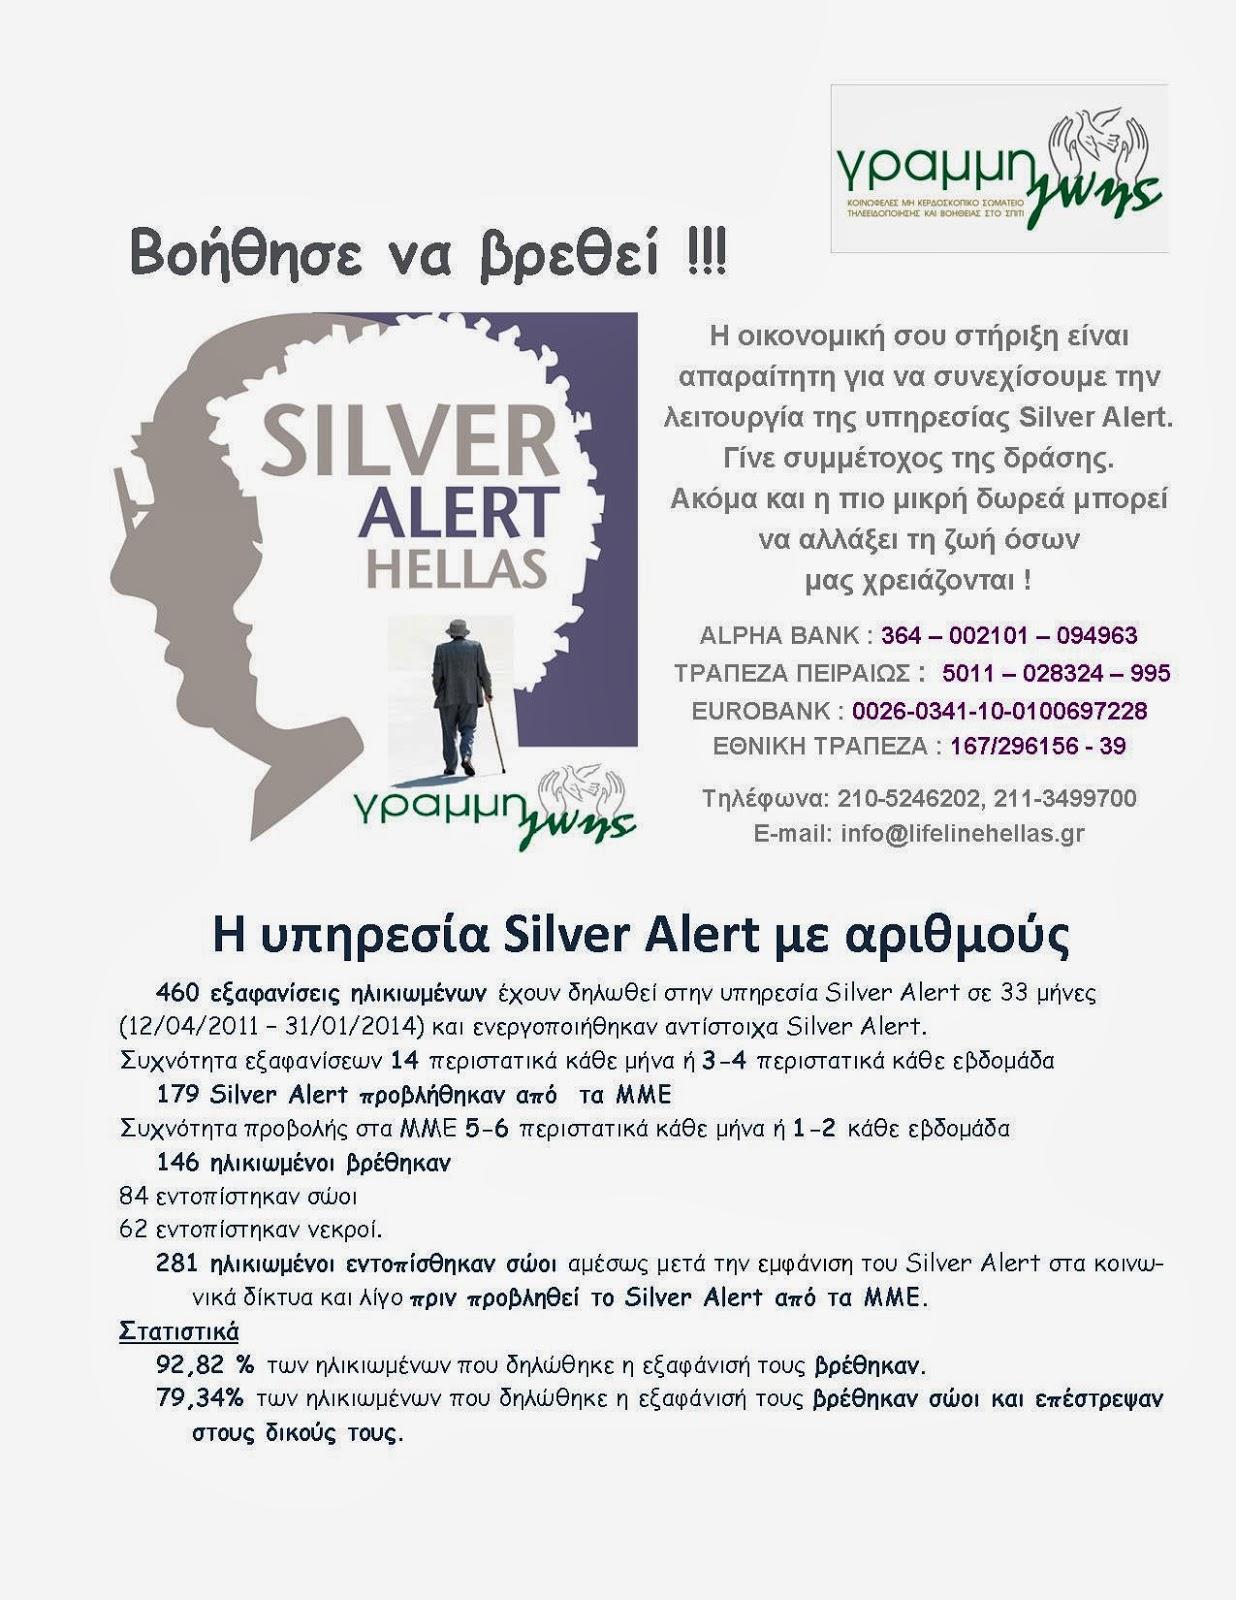 http://blue-force-blog.blogspot.gr/2014/03/silver-alert-sos.html